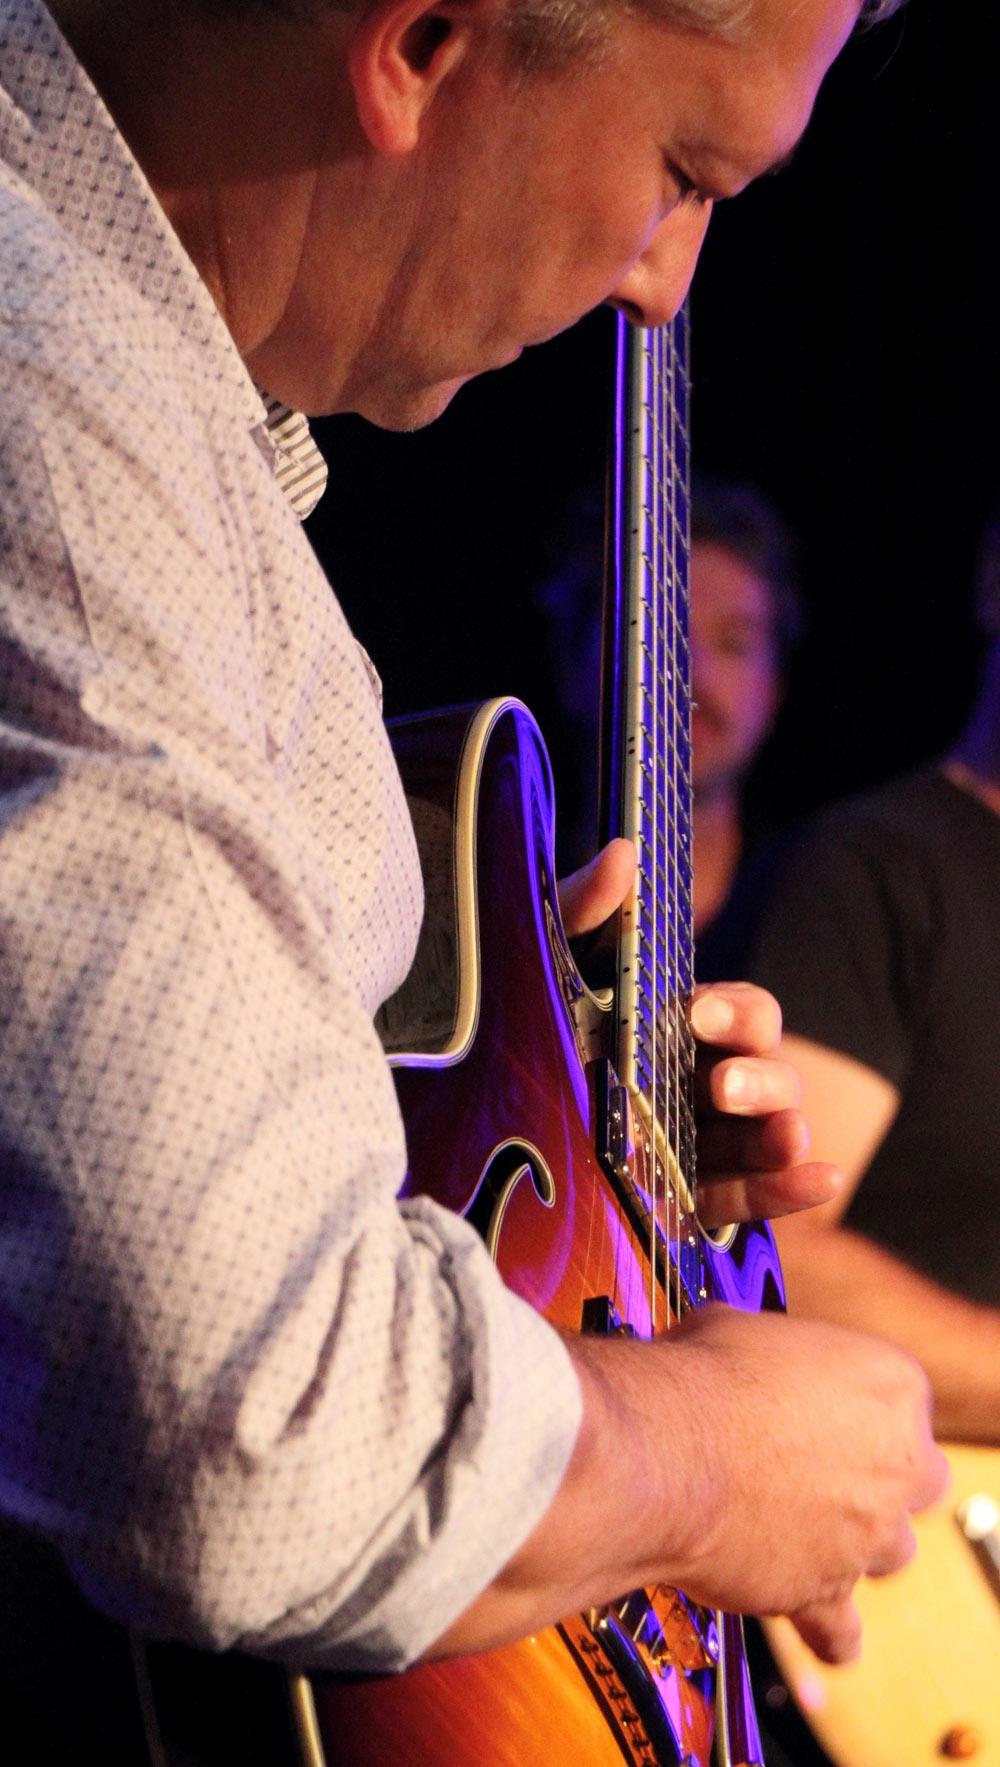 Eric jammin' on the guitar